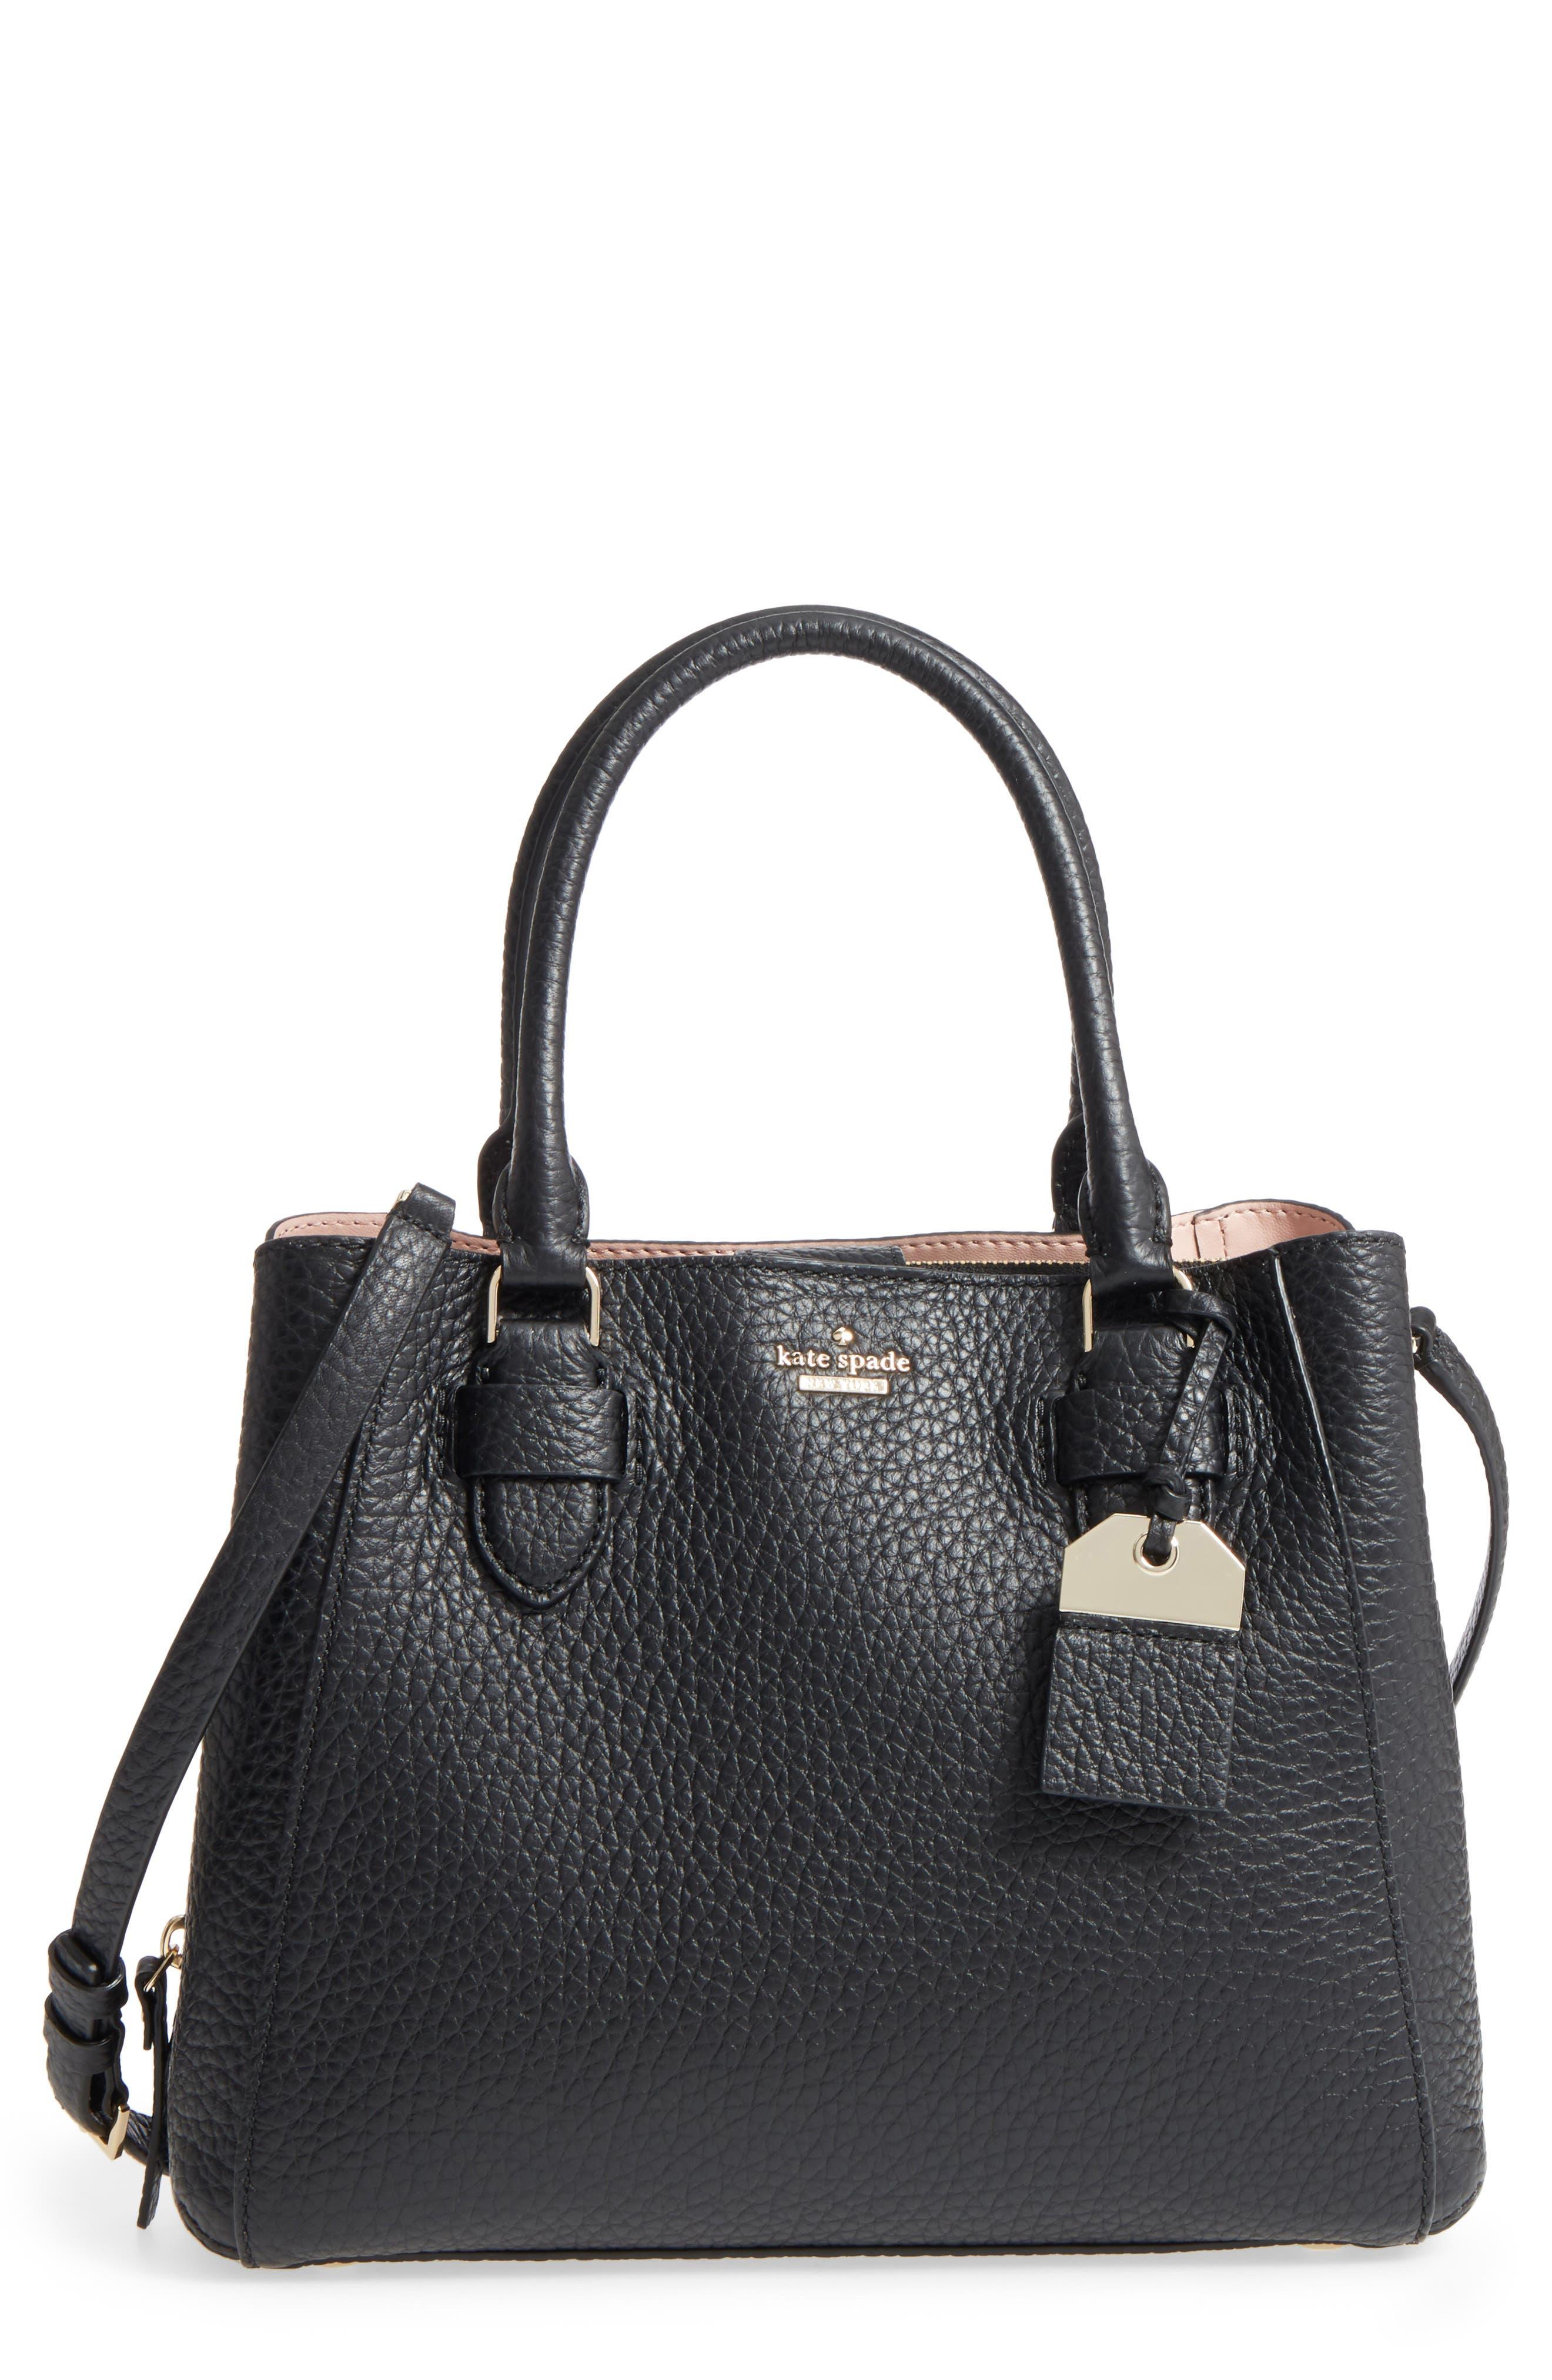 carter street - aliana leather satchel,                             Main thumbnail 1, color,                             001